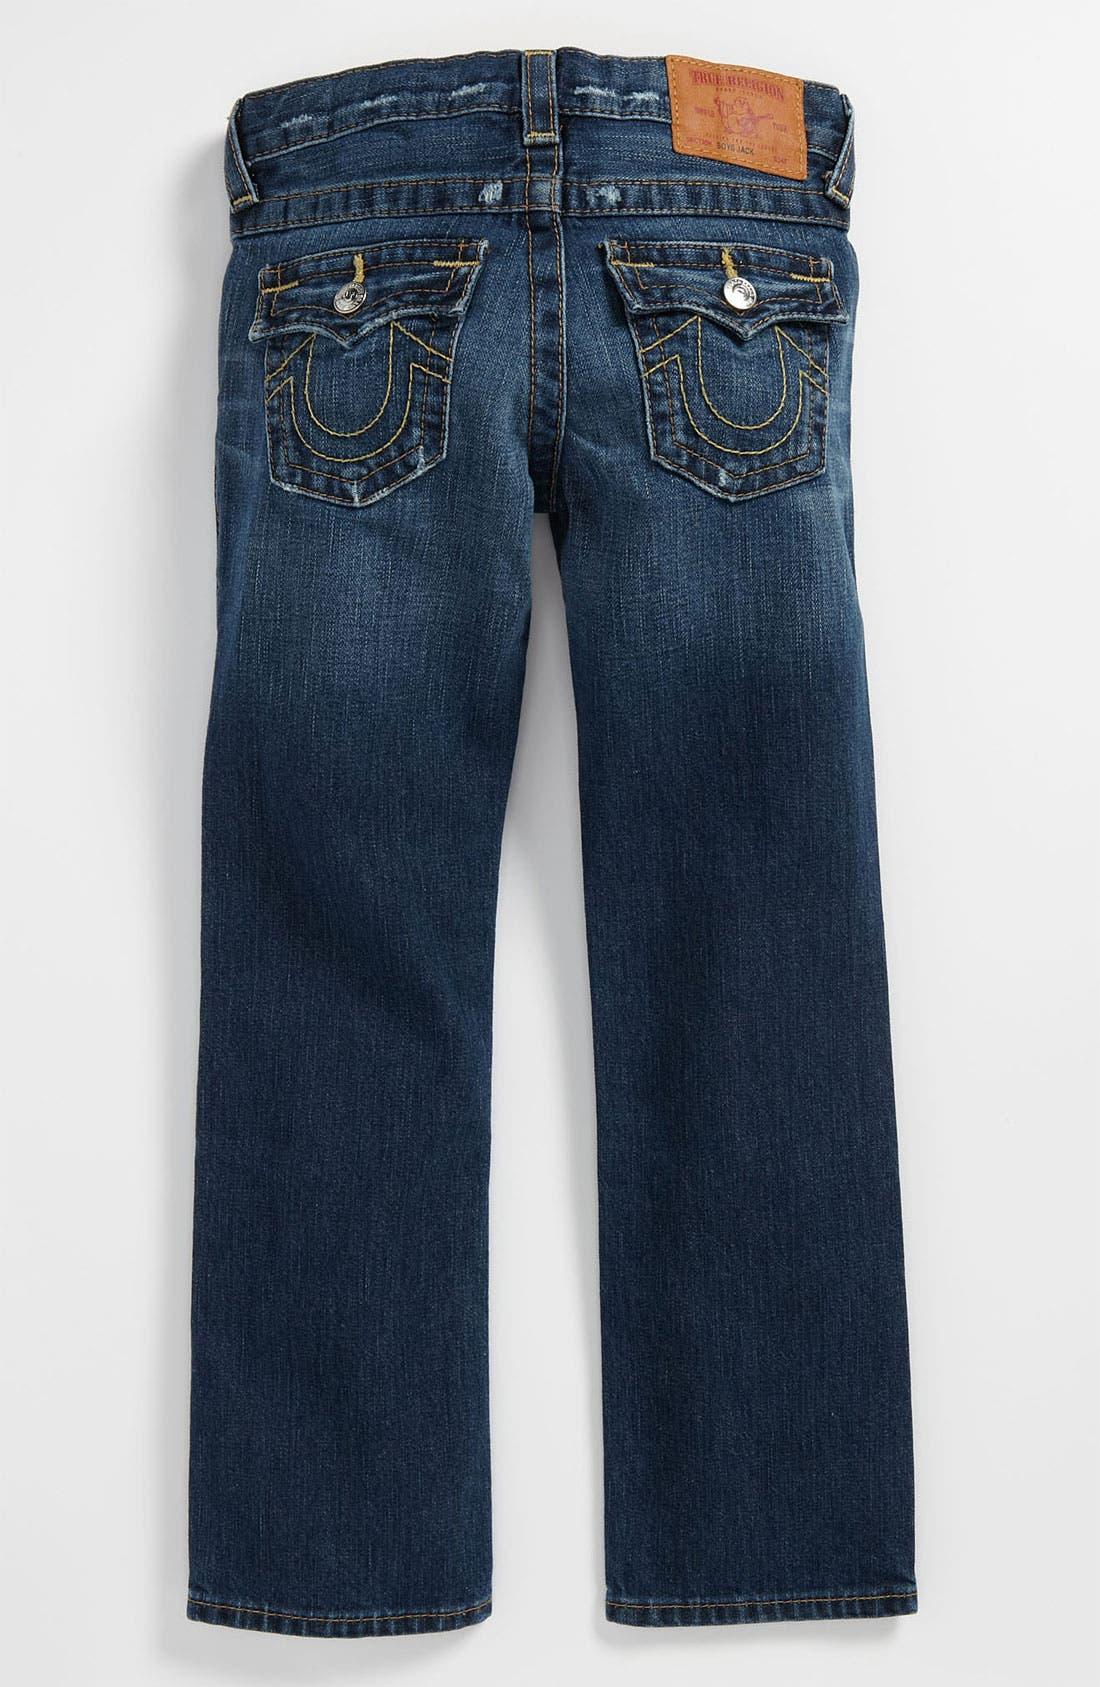 Alternate Image 1 Selected - True Religion Brand Jeans 'Jack Rip & Repair' Jeans (Little Boys)